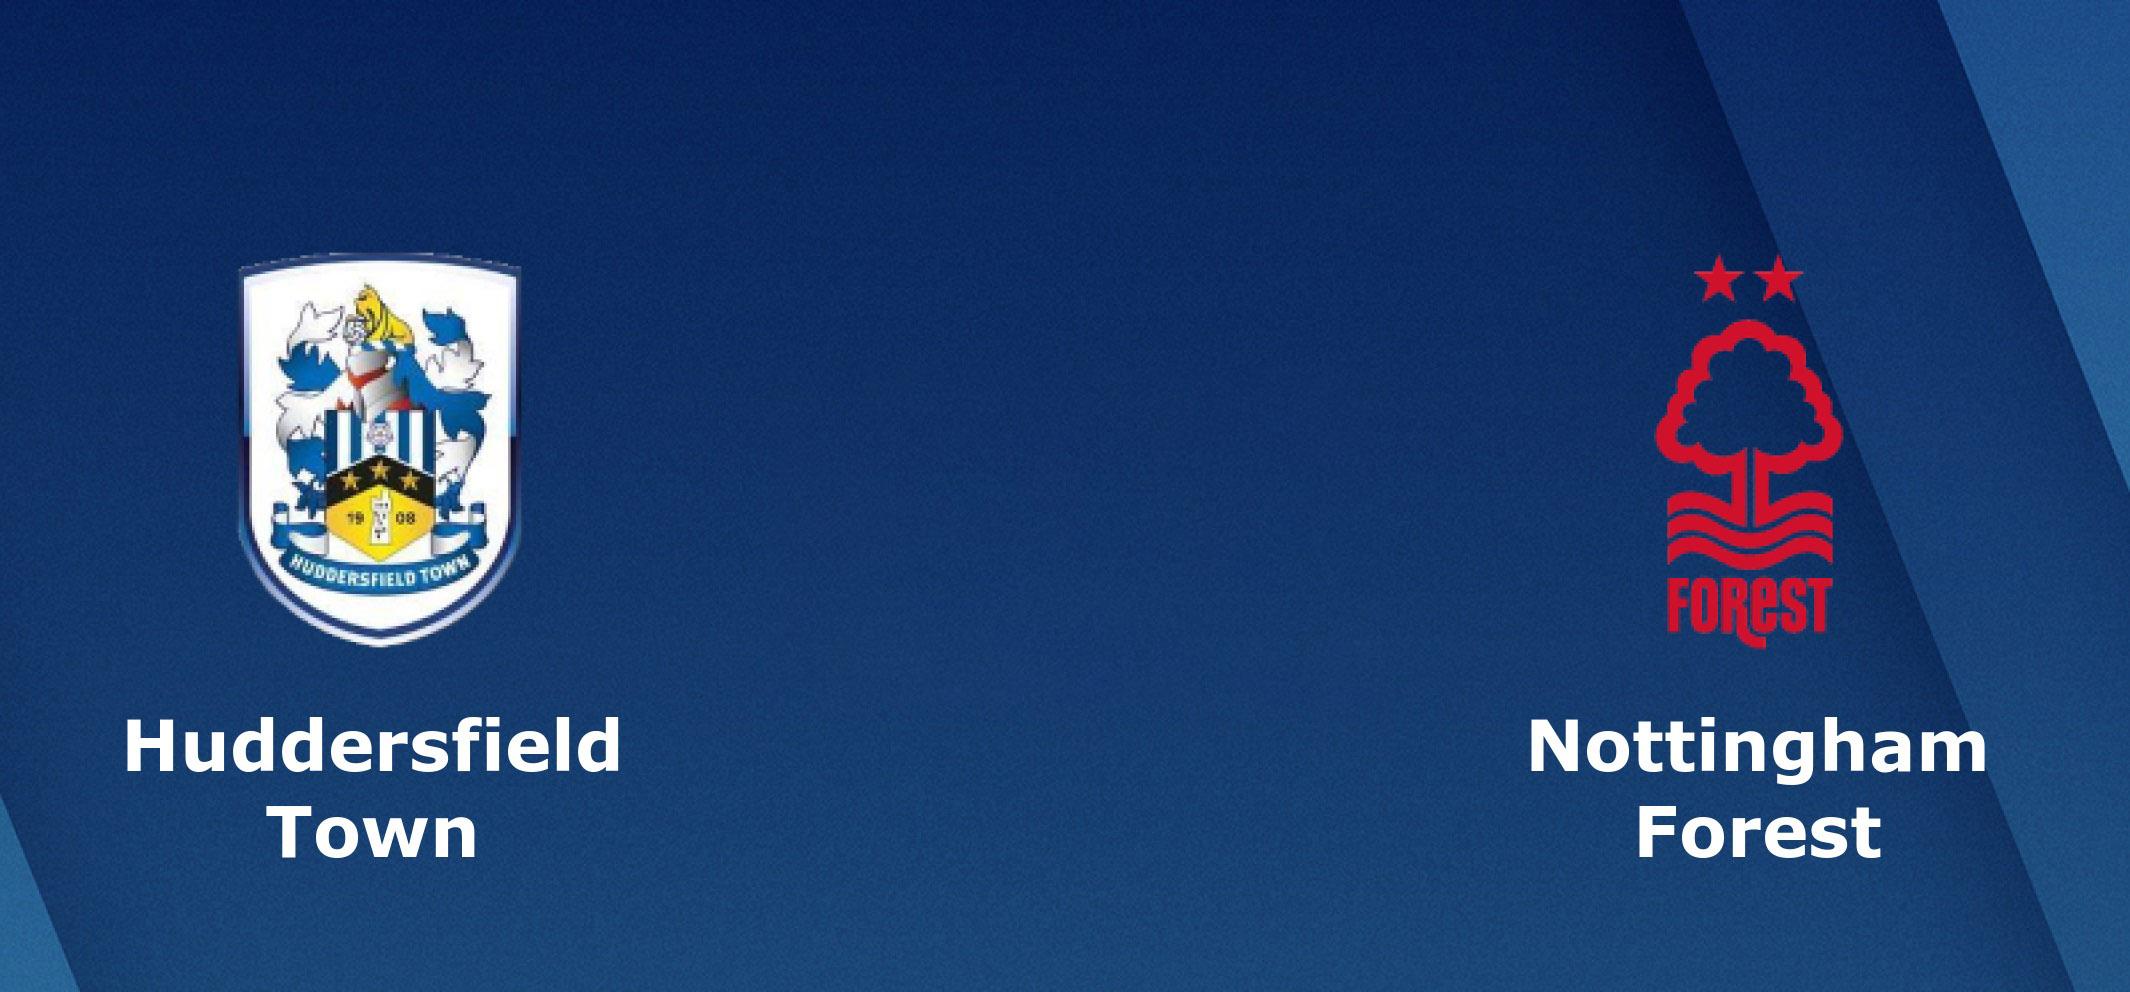 soi-keo-bong-da-huddersfield-town-vs-nottingham-forest-–-22h00-21-12-2019-–-giai-hang-nhat-anh-fa (5)